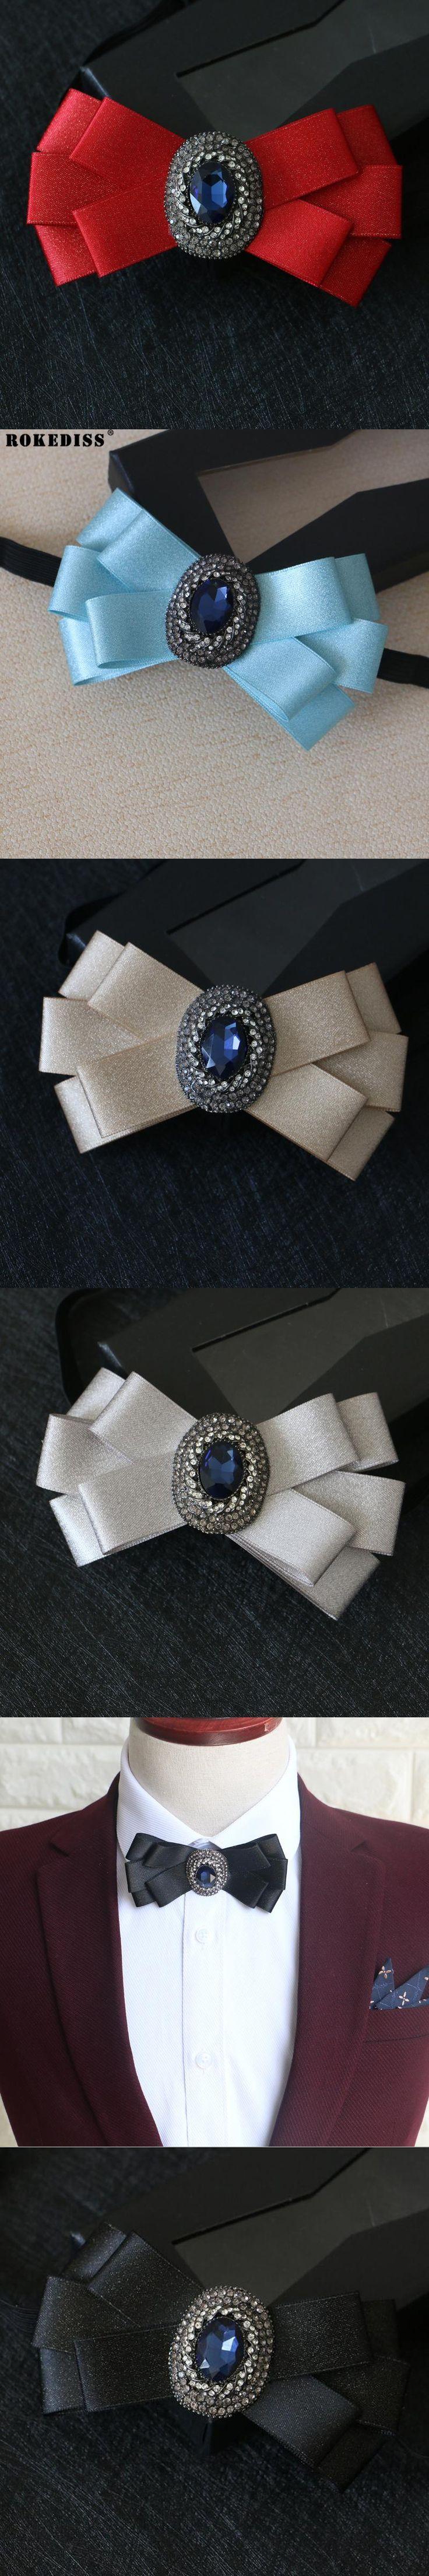 ROKEDISS Groom wedding diamond bow tie groom wedding dress Korean version female bow black British men bow tie Z306